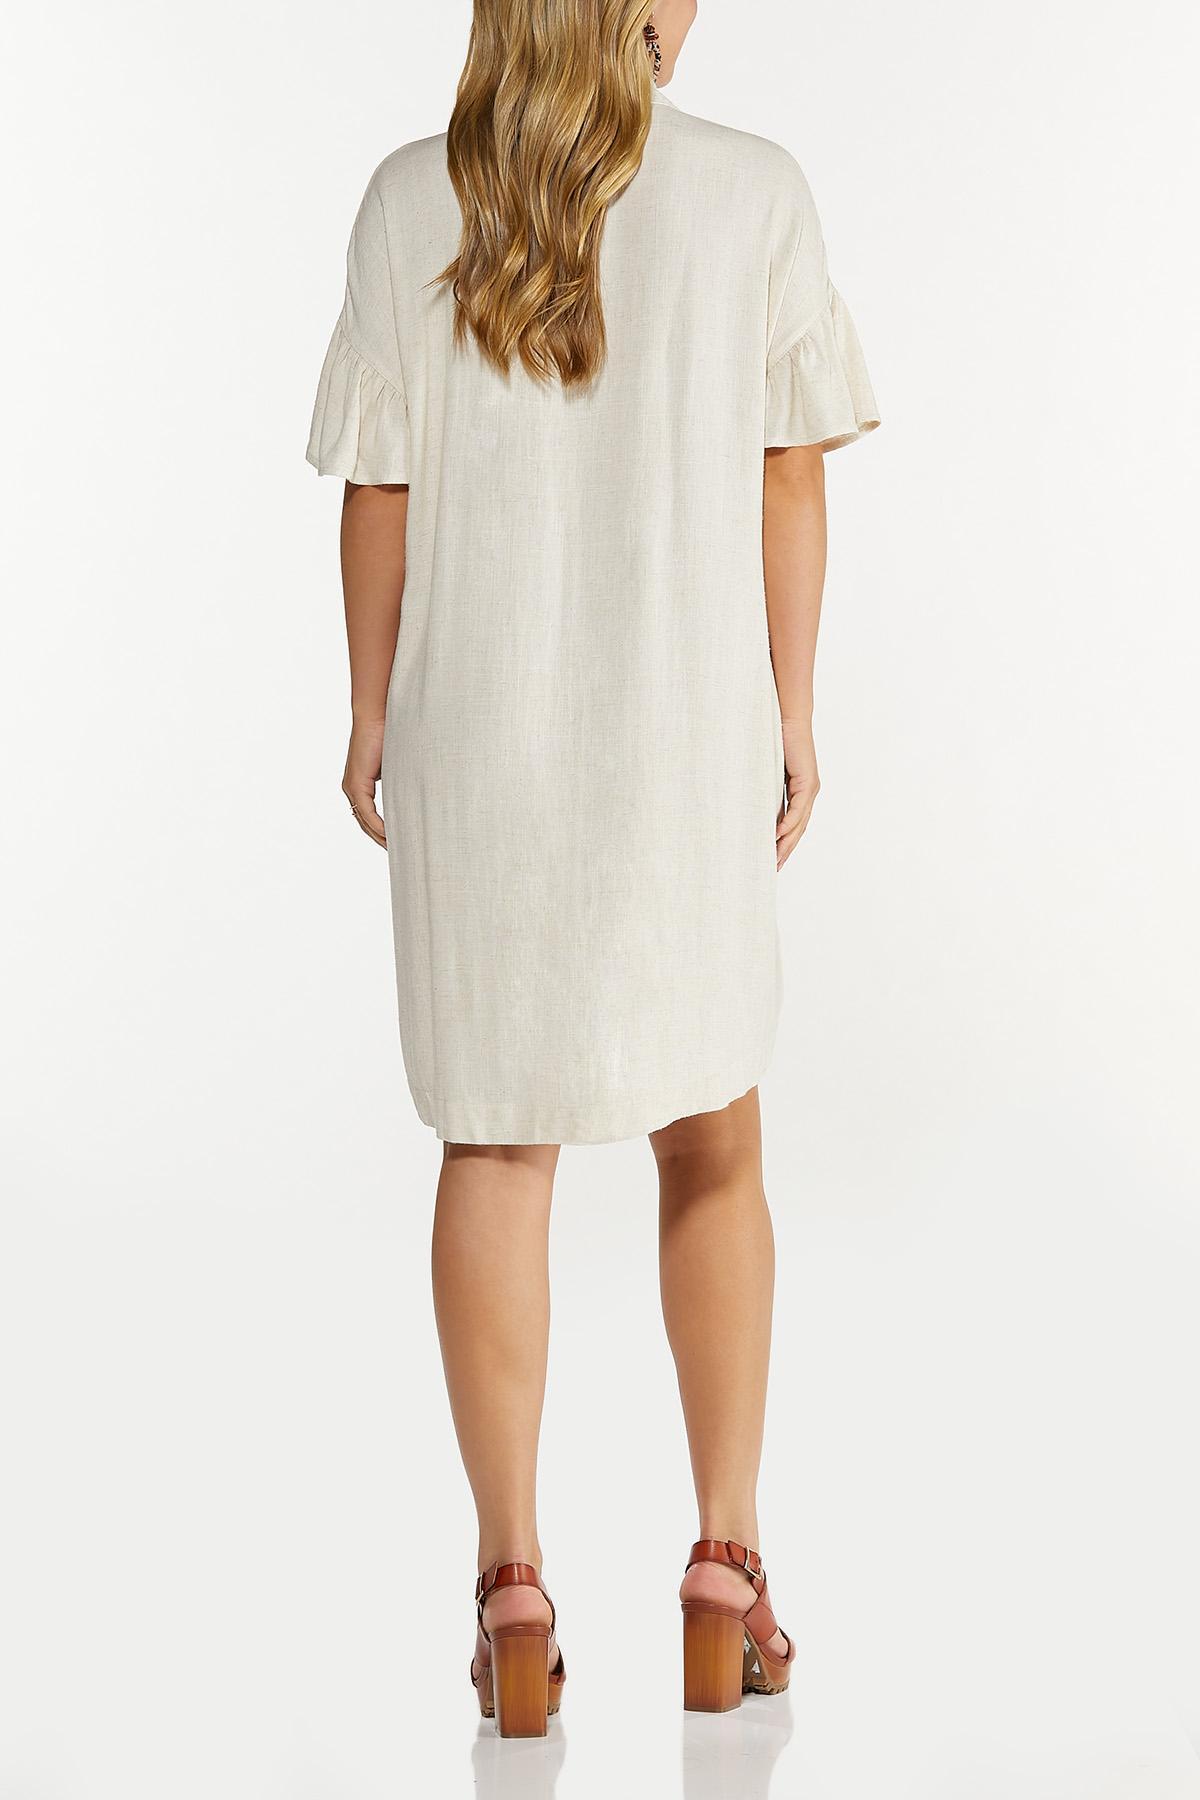 Ruffled Sleeve Linen Dress (Item #44619576)